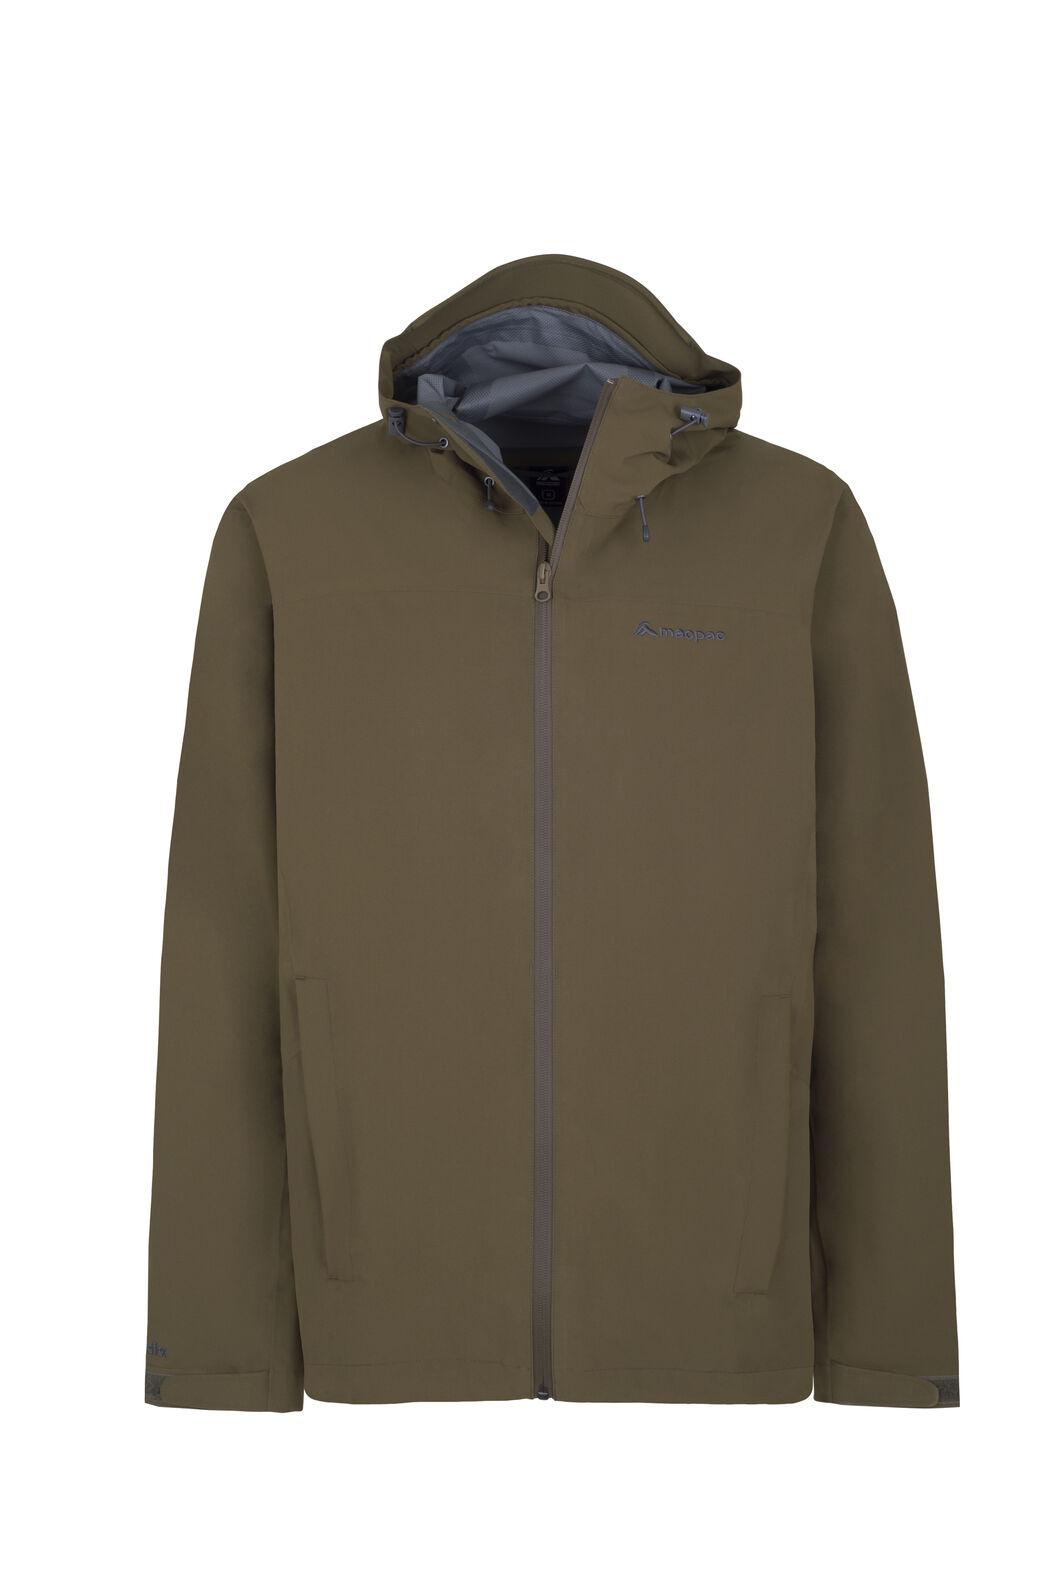 Macpac Dispatch Rain Jacket — Men's, Military Olive, hi-res